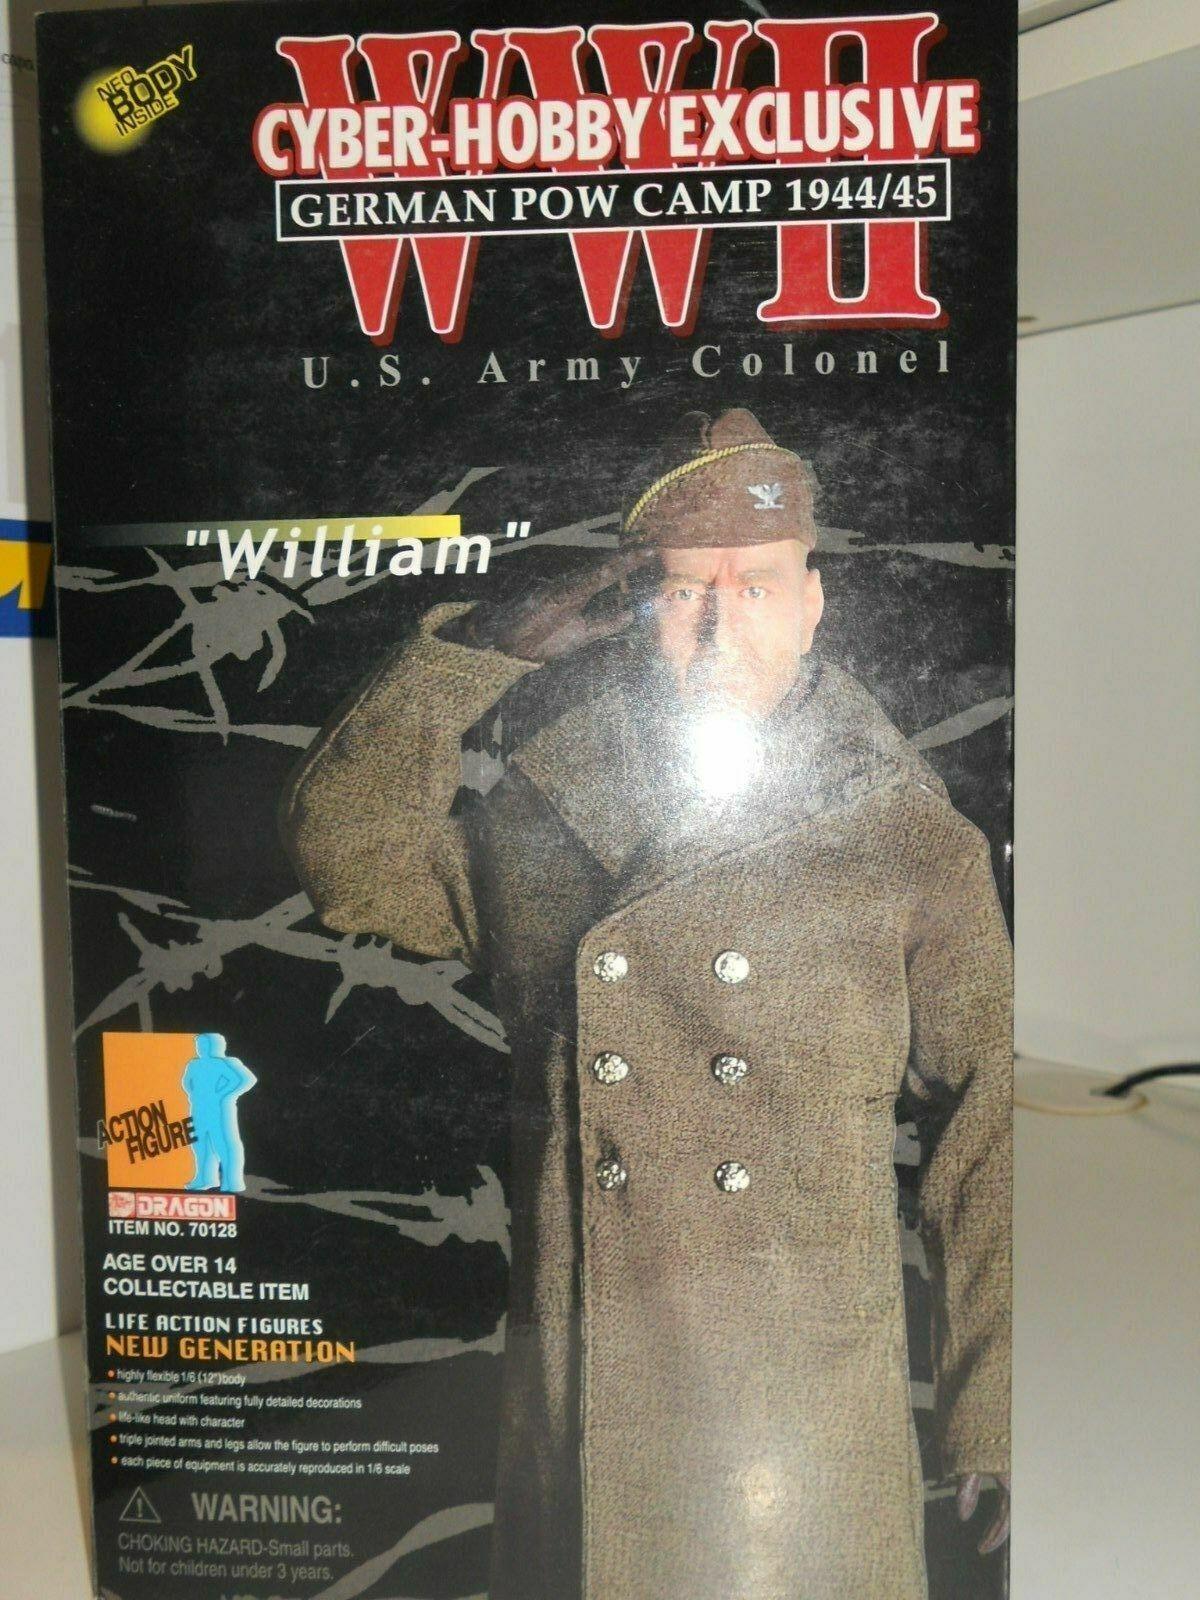 DRAGON ACTION FIGURE WILLIAM U.S. ARMY COLONEL GERMAN POW CAMP 1944 45 753521